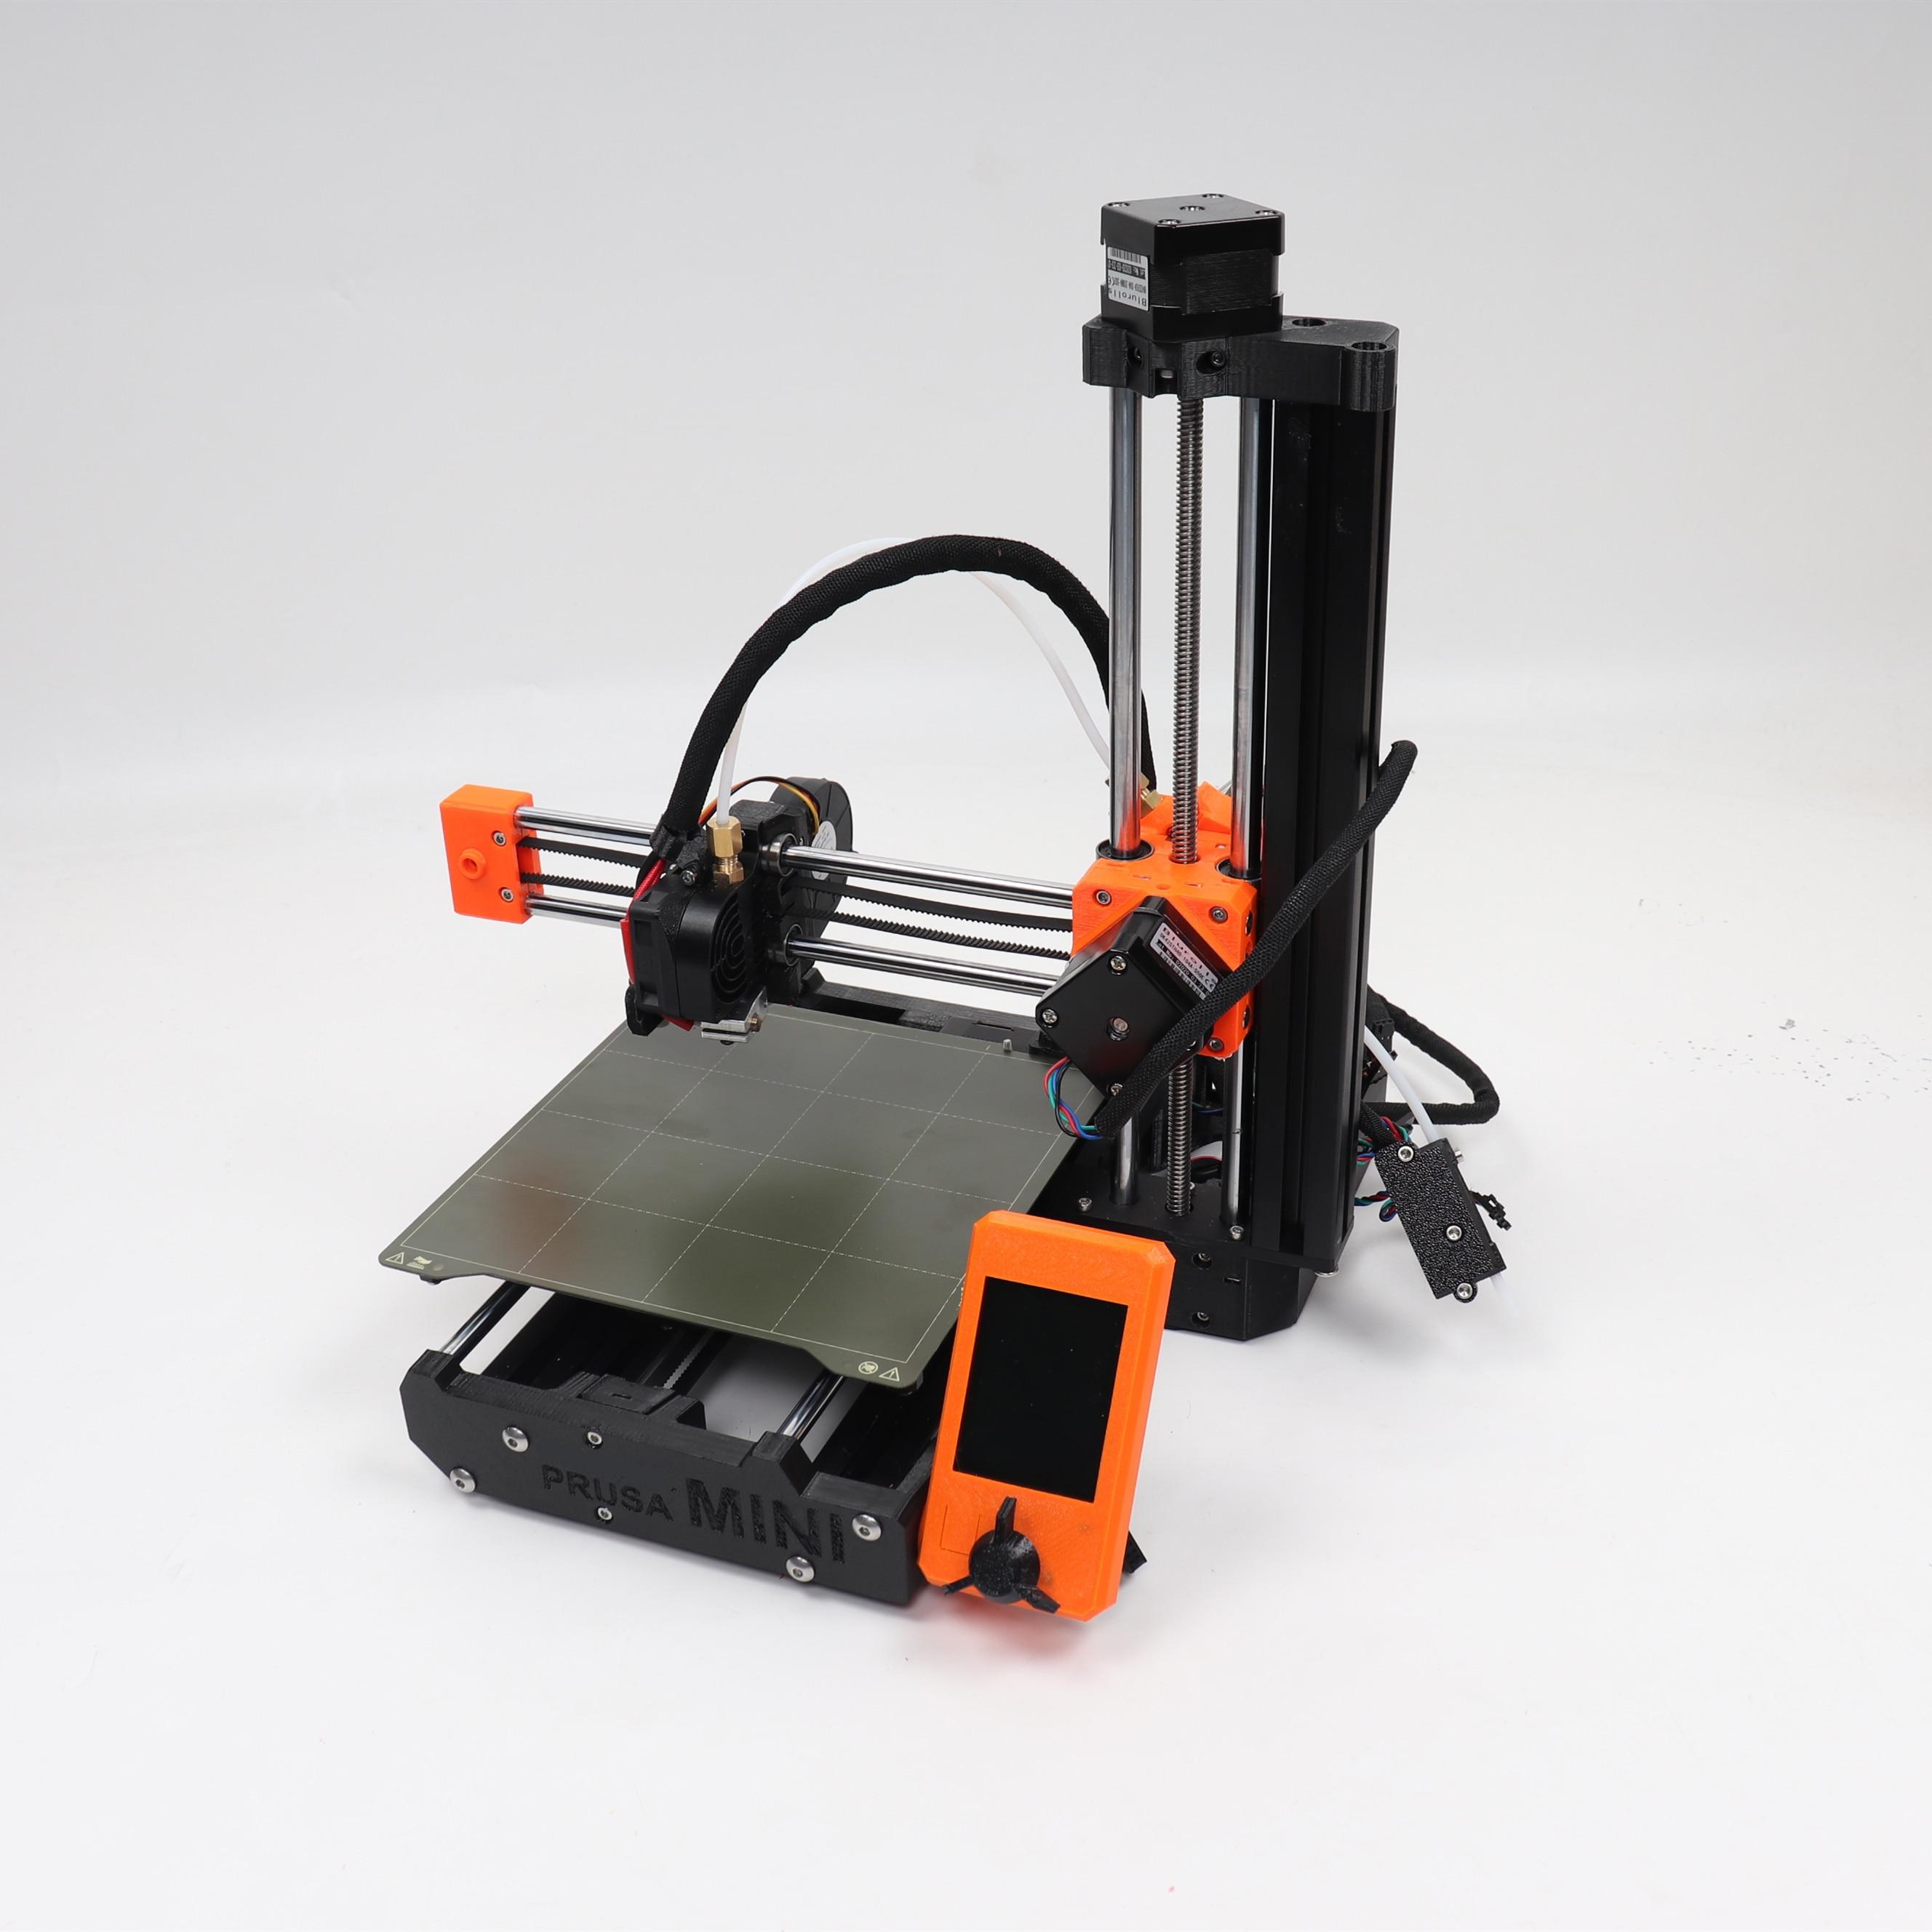 Prusa Mini 3d Printer Diy Penuh Kit Termasuk Meanswell PSU Sunon Kipas Angin filamen Sensor Memesan (Tidak Dirakit)